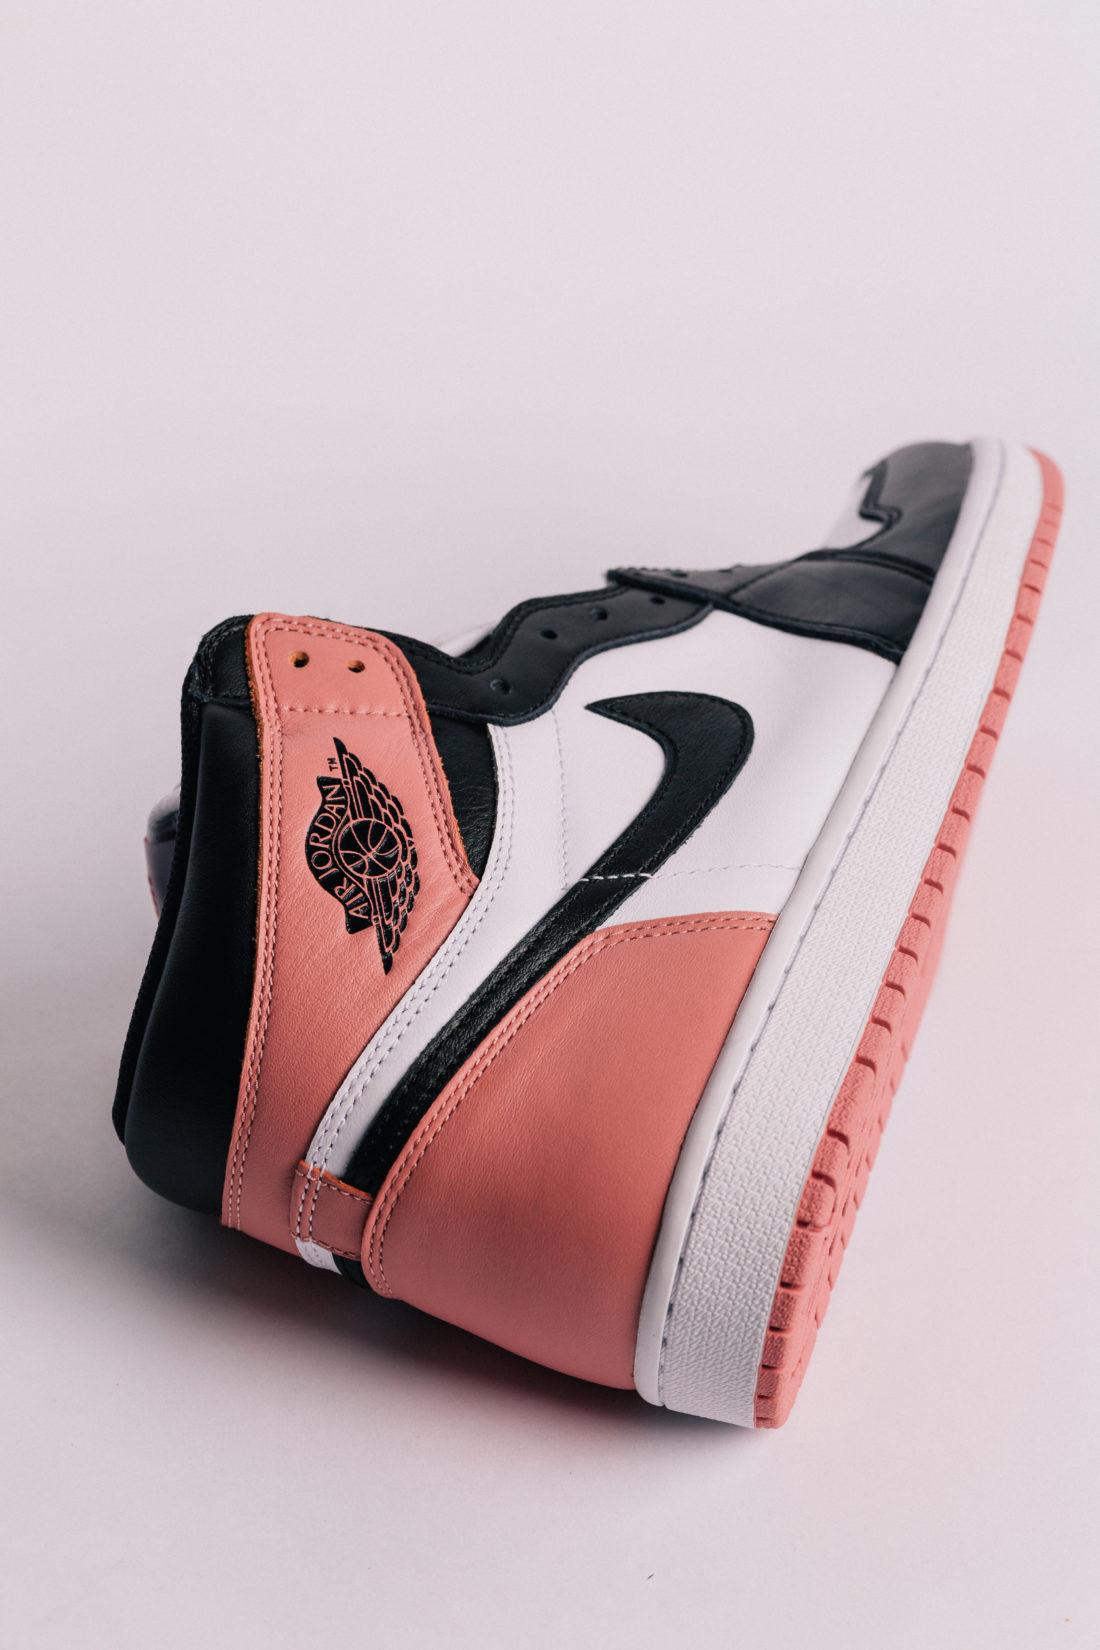 AJ1 Rust Pink Nigel Sylvester